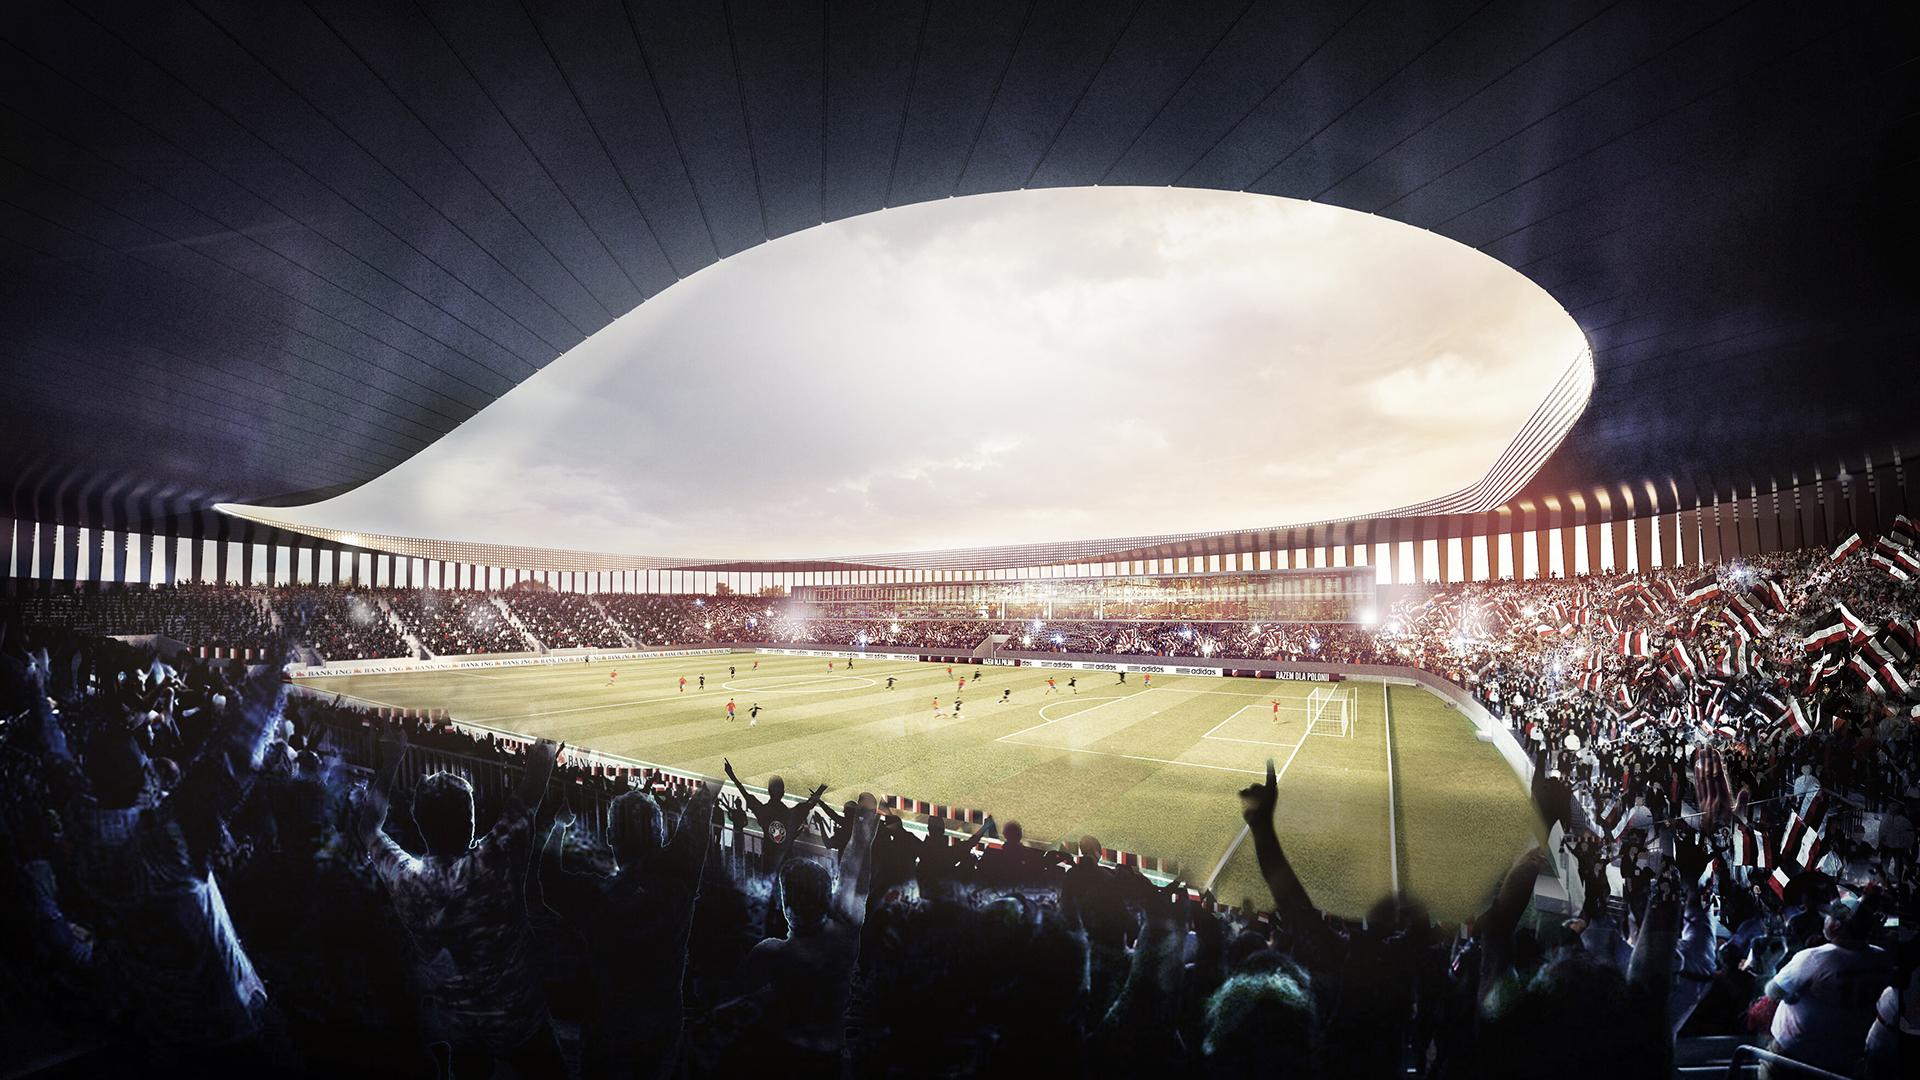 polonia-stadium-4